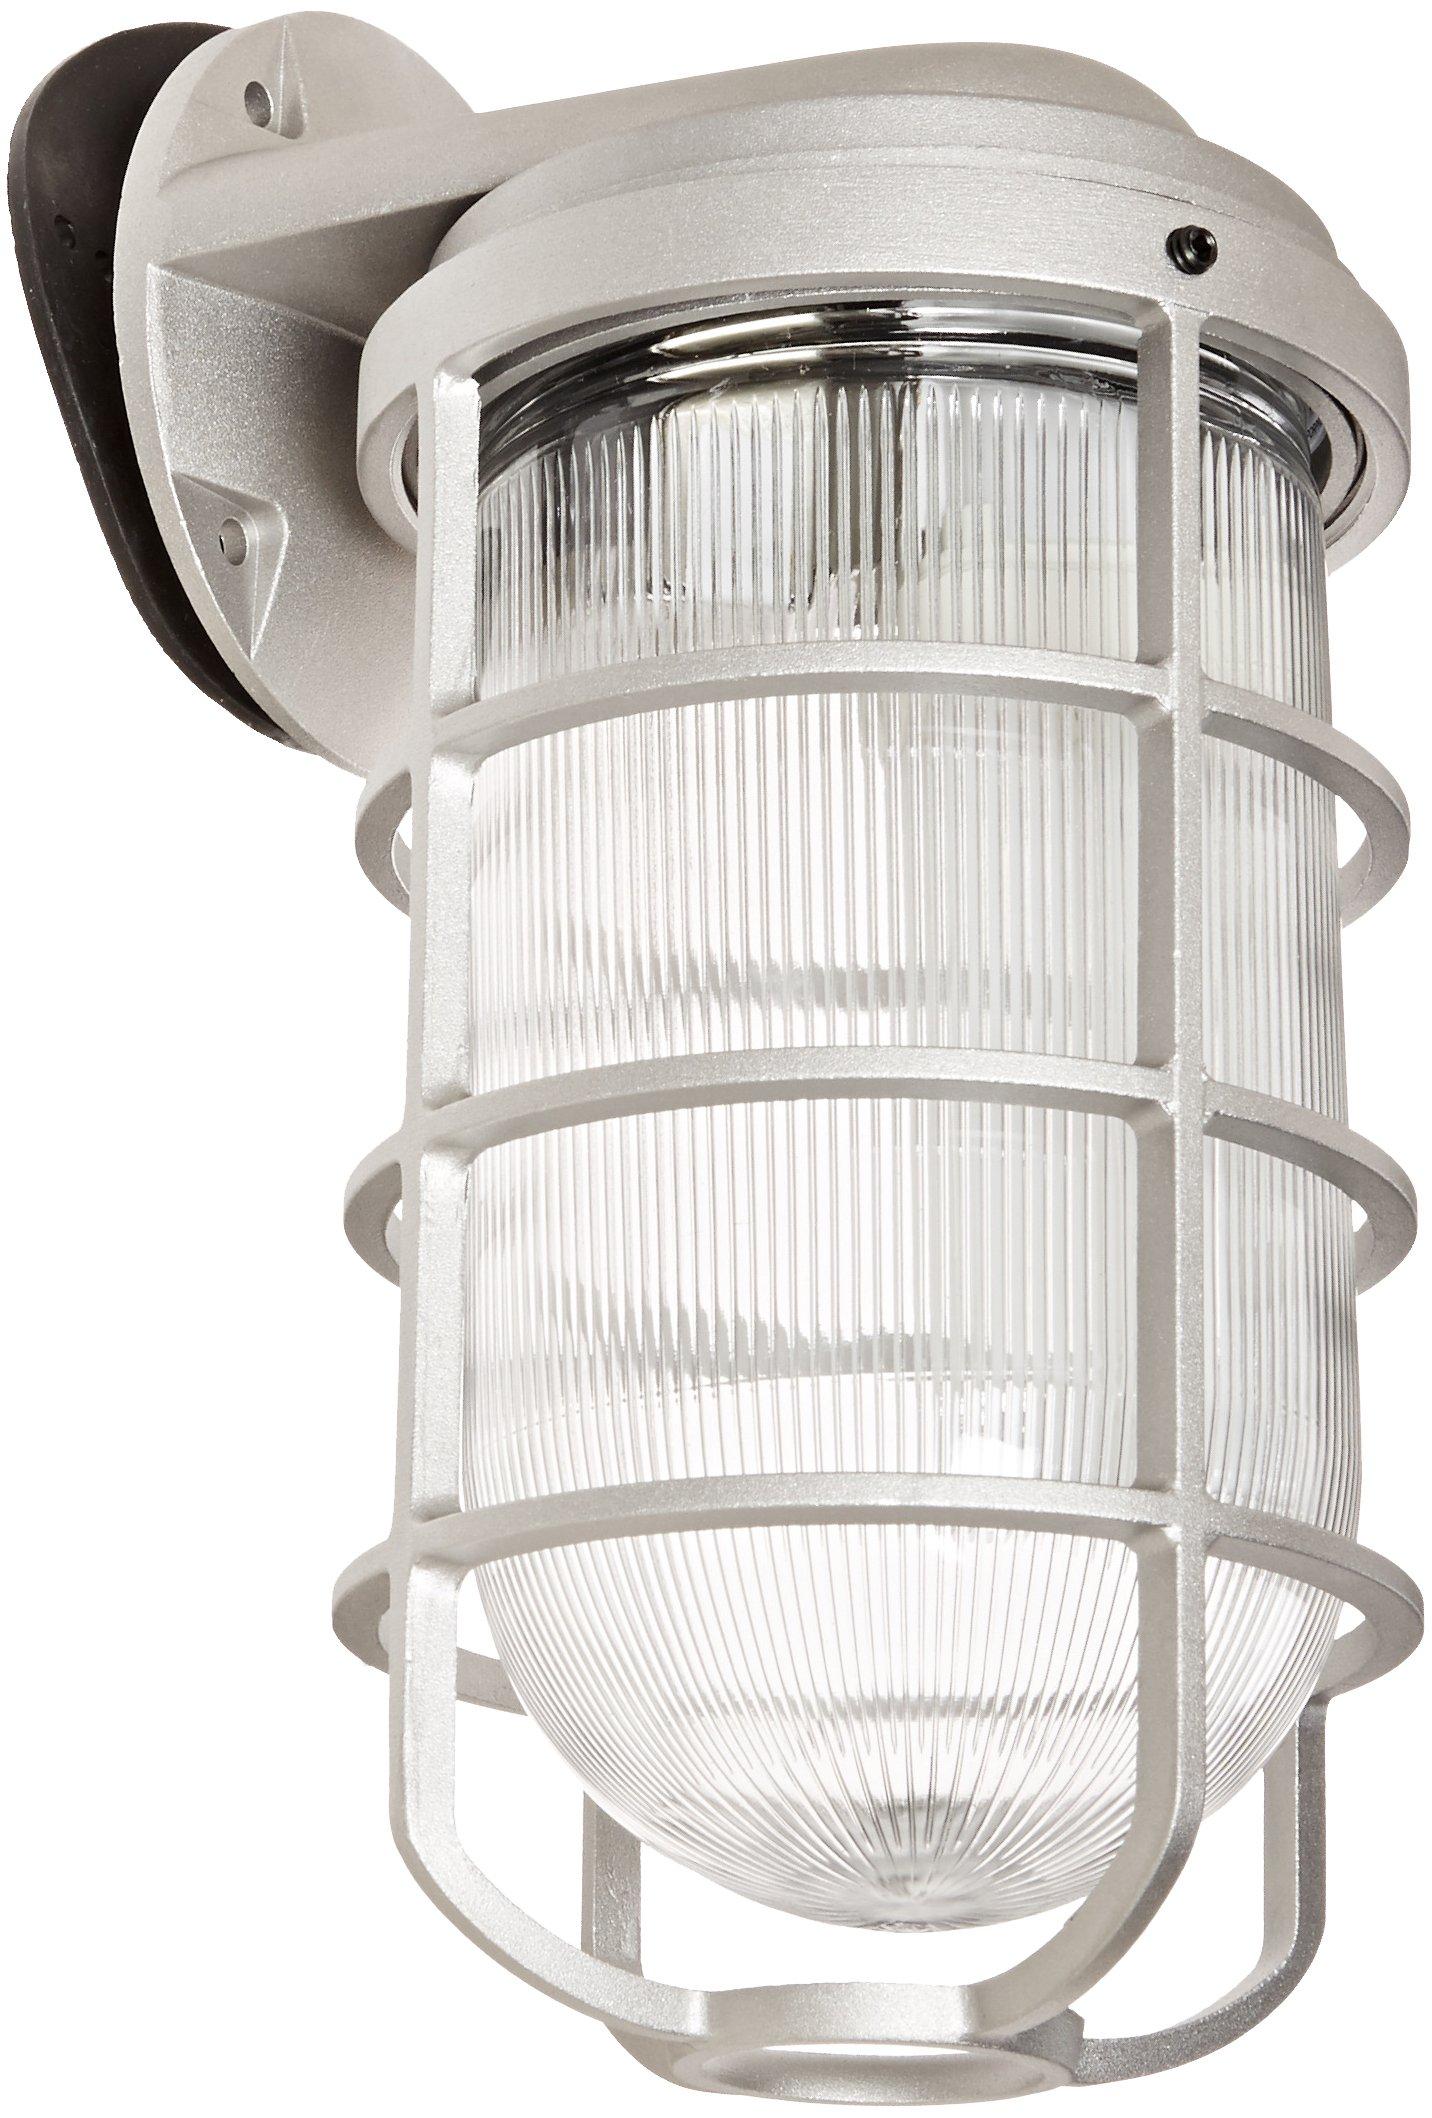 RAB Lighting VBR200DG/F22 Vaporproof Glass Globe Cast Guard Compact Fluorescent Fixtures with Wall Mount Bracket, Quad Type, Aluminum, 22W Power, 1200 Lumens, 120V, Natural by RAB Lighting (Image #1)